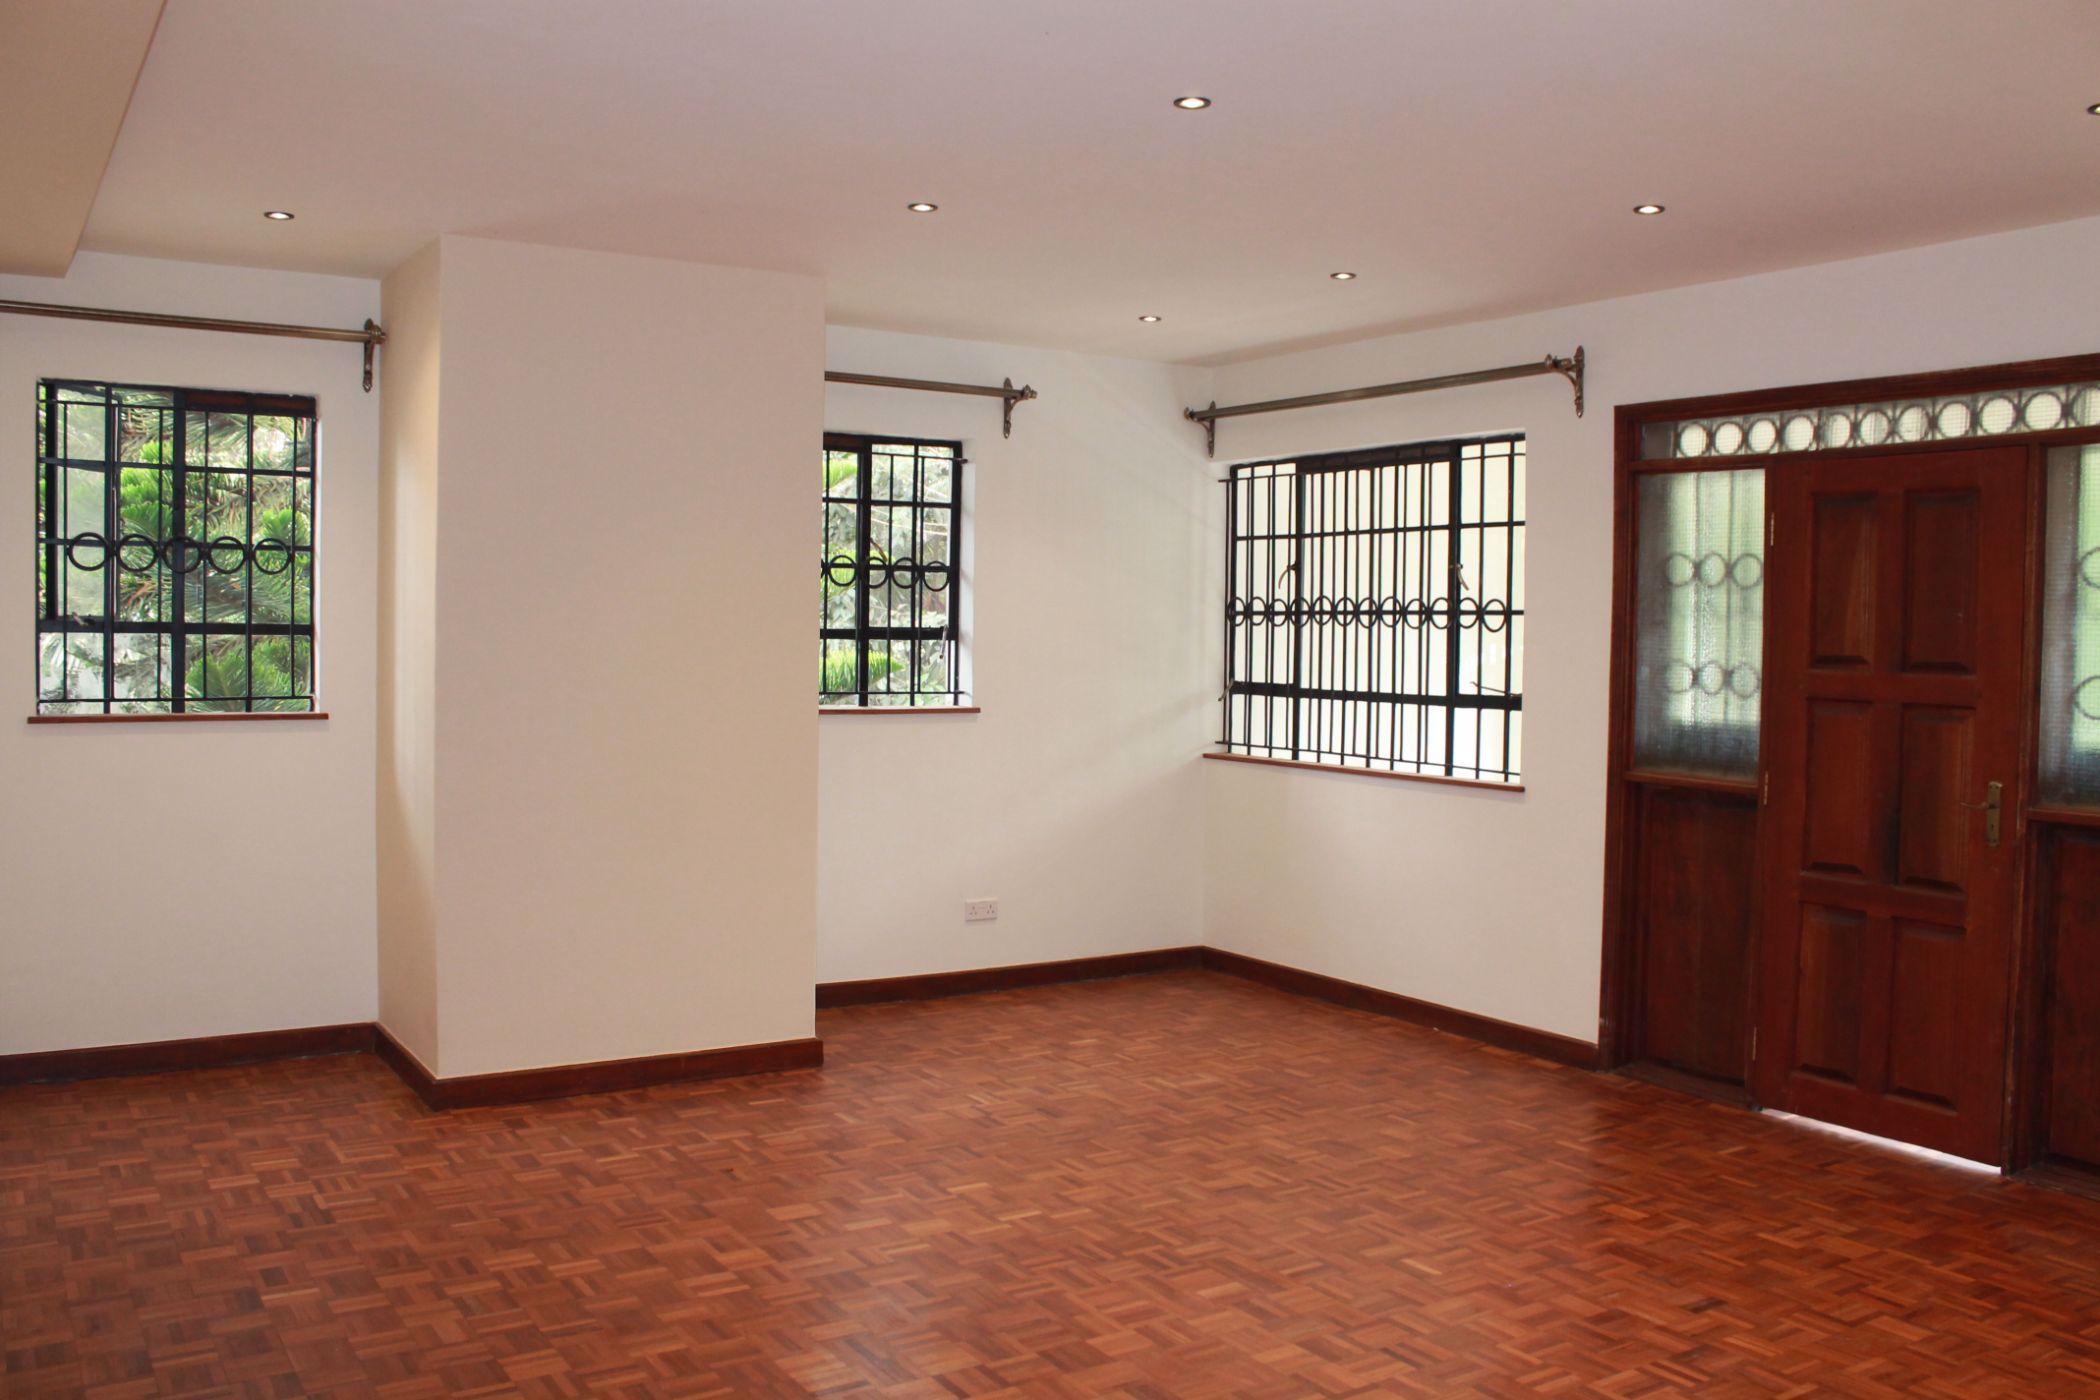 6 bedroom house to rent in Spring Valley (Kenya)